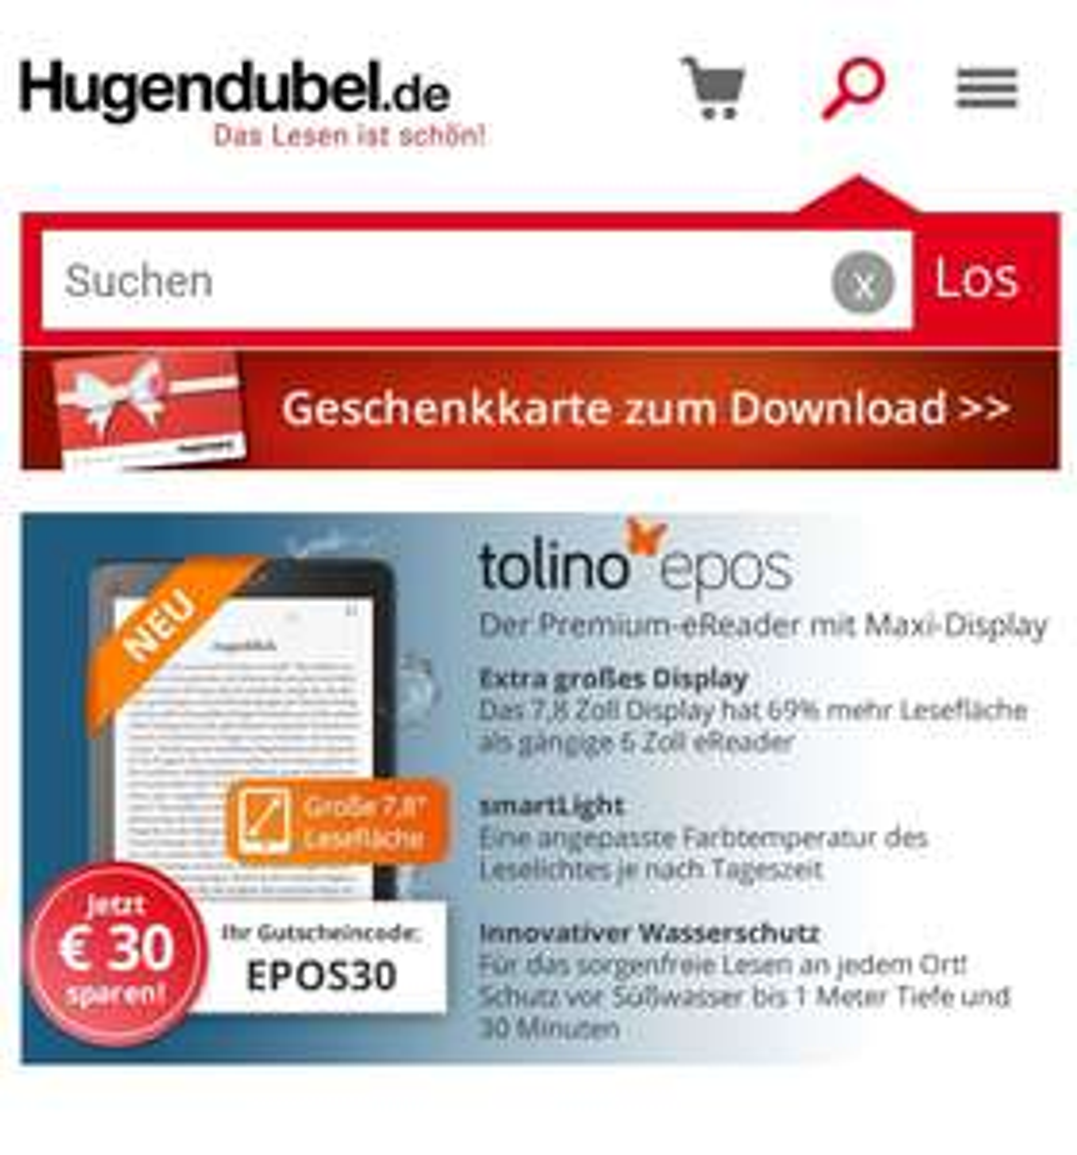 Tolino Epos 30 Euro Rabatt - Hugendubel 199 statt 229 (ca. 13% Ersparniss)